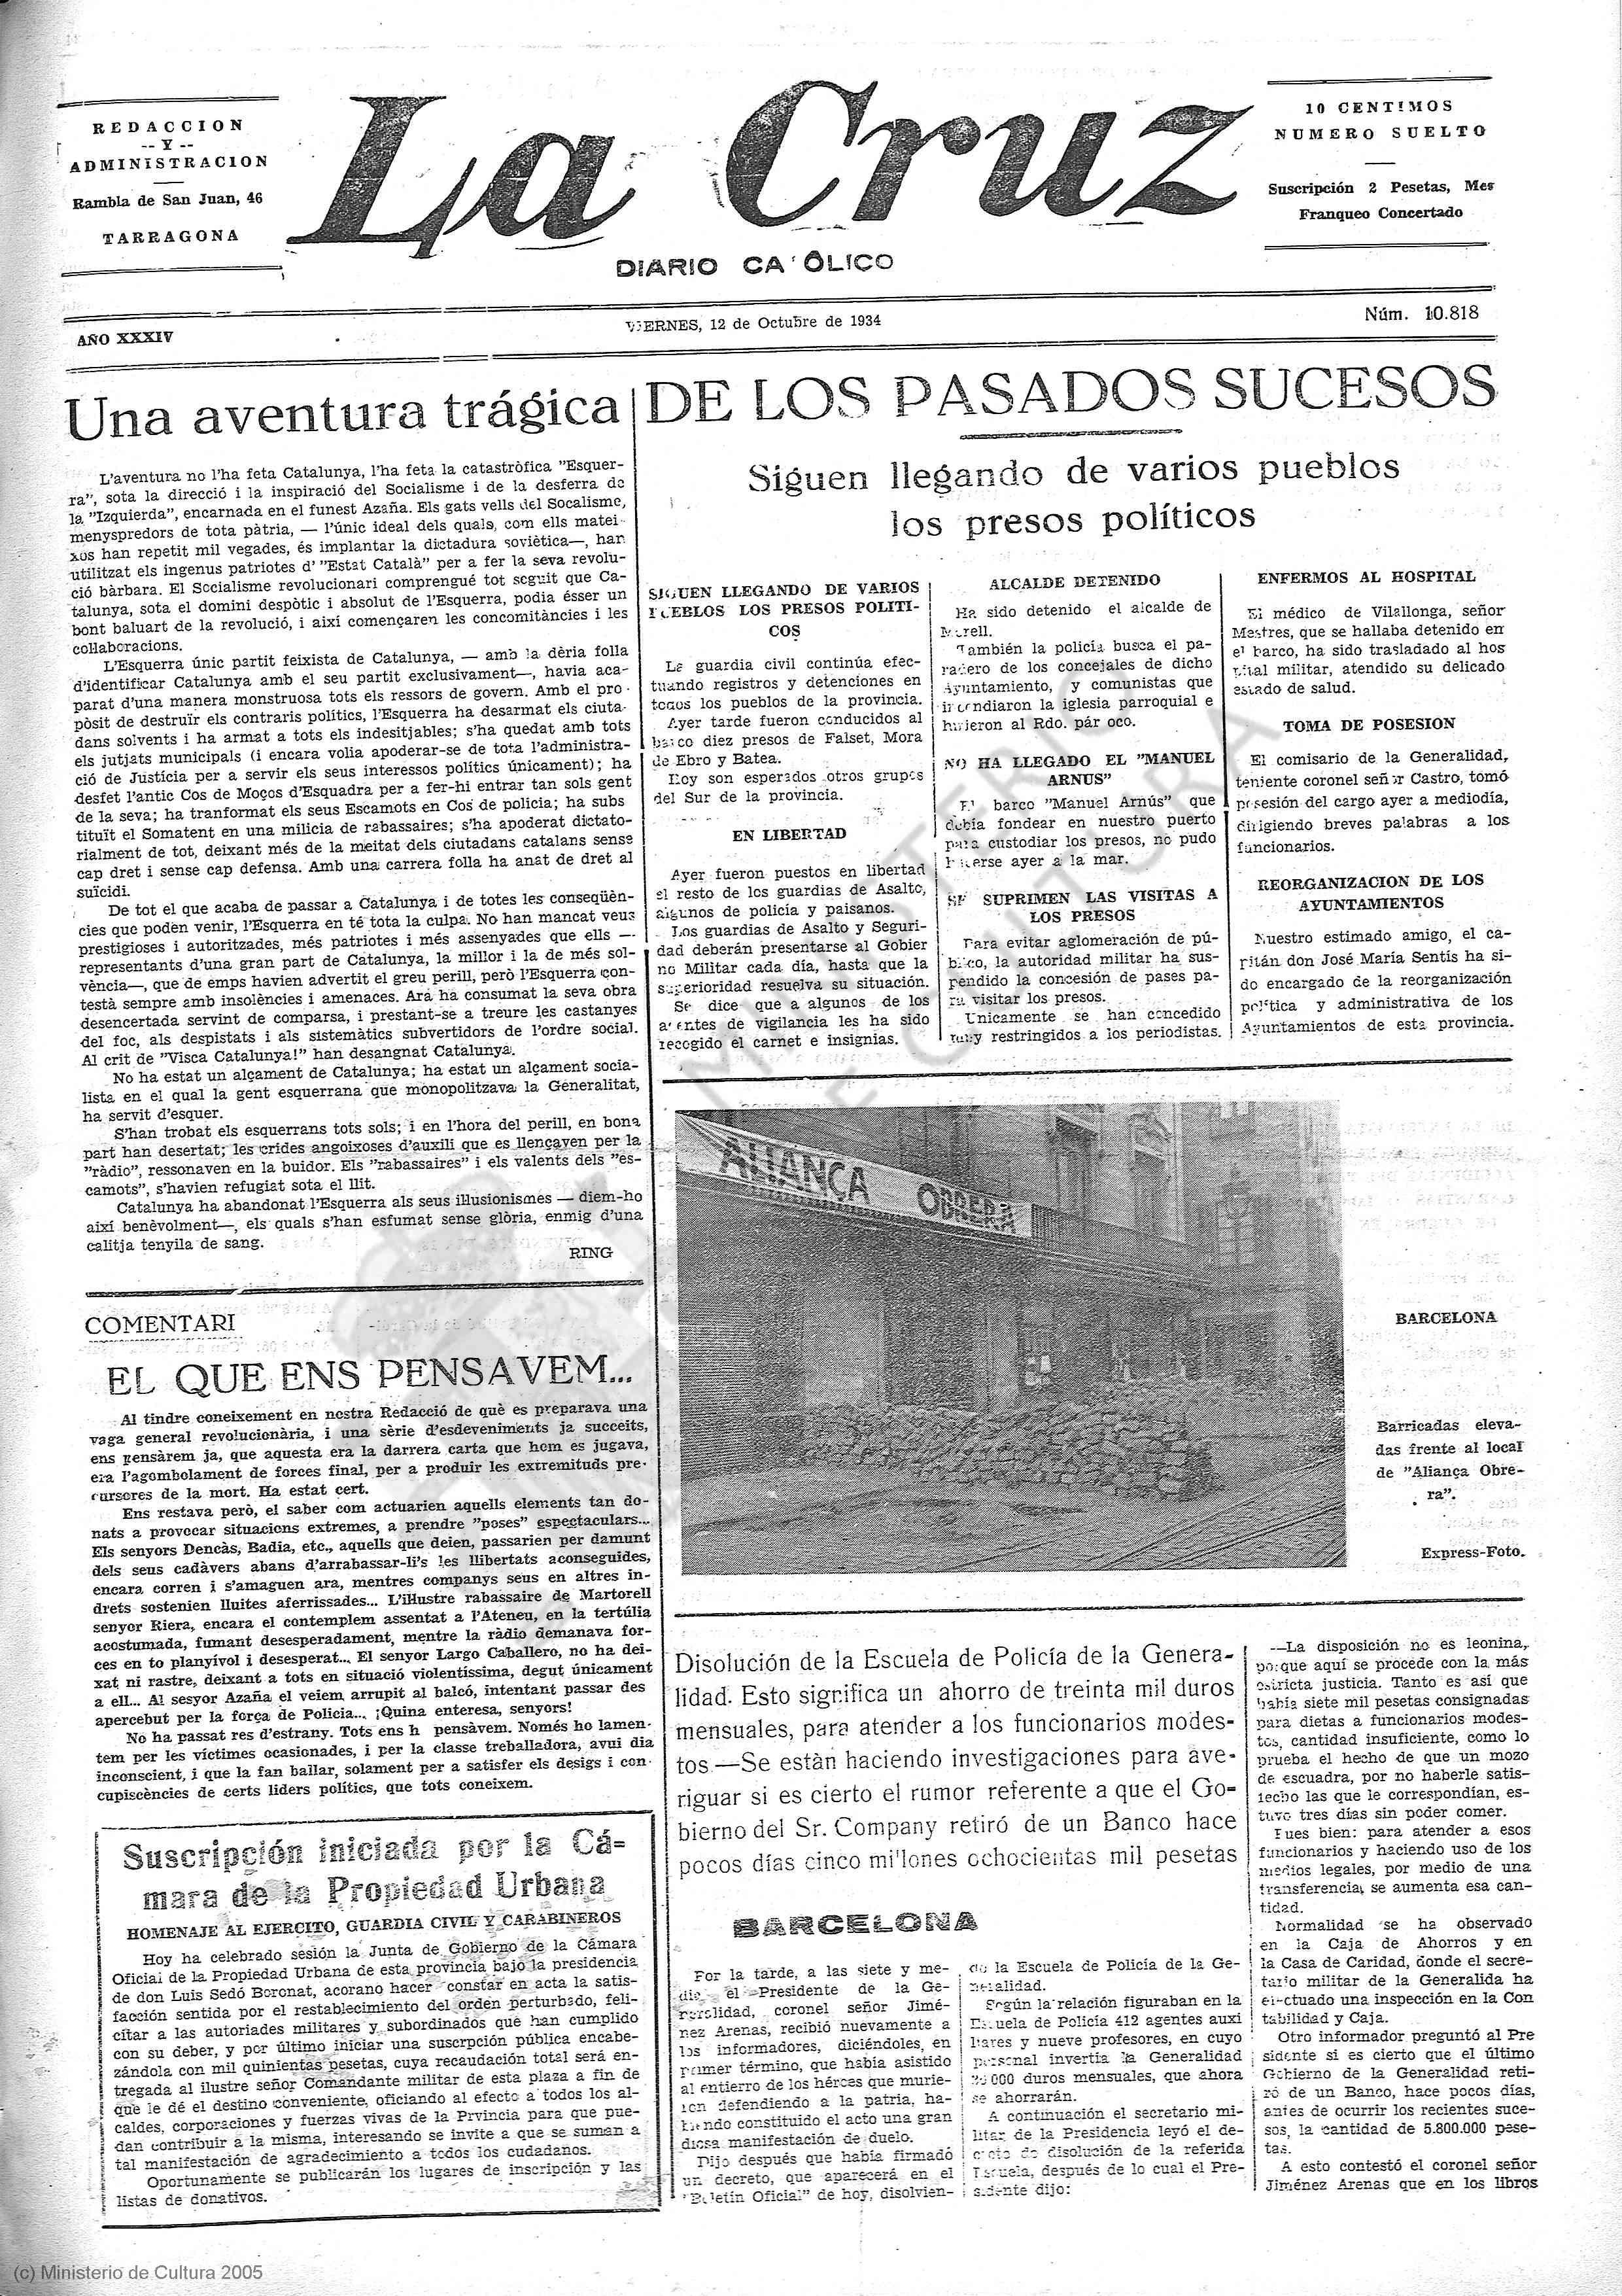 La Cruz, 12 de octubre de 1934.